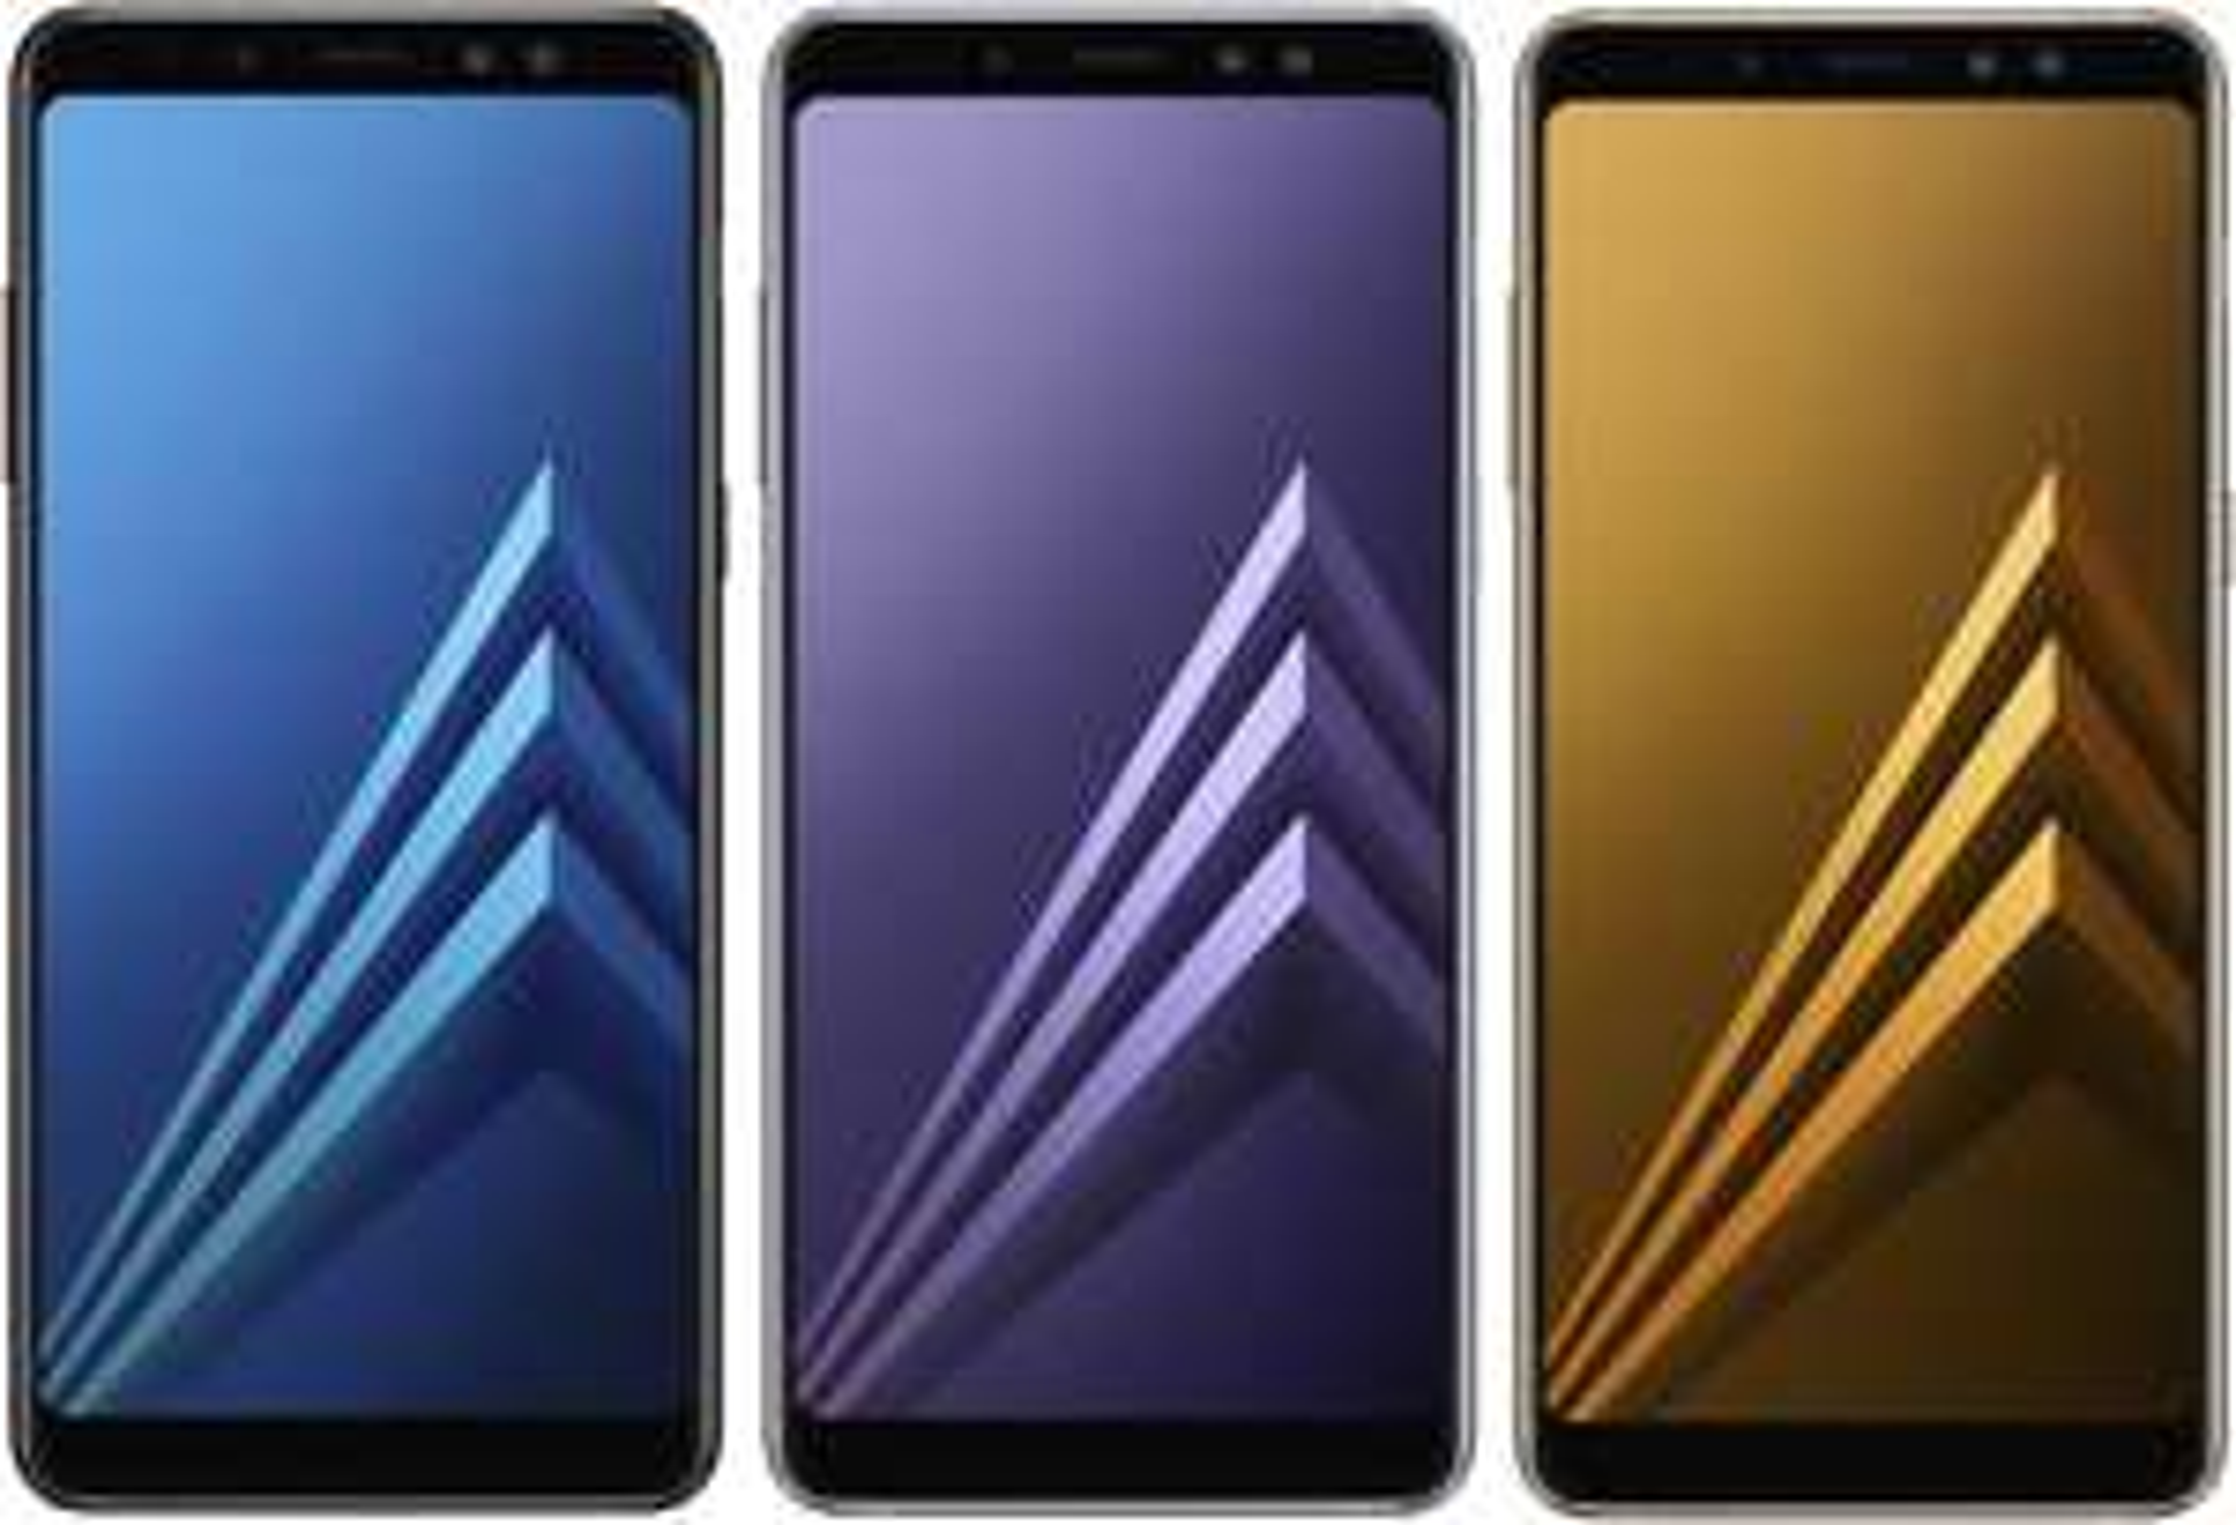 [universal.at] Samsung Galaxy A8 (2018) DUOS 5,6 Super AMOLED Infinity Display für 273,20€ + Versand nach D